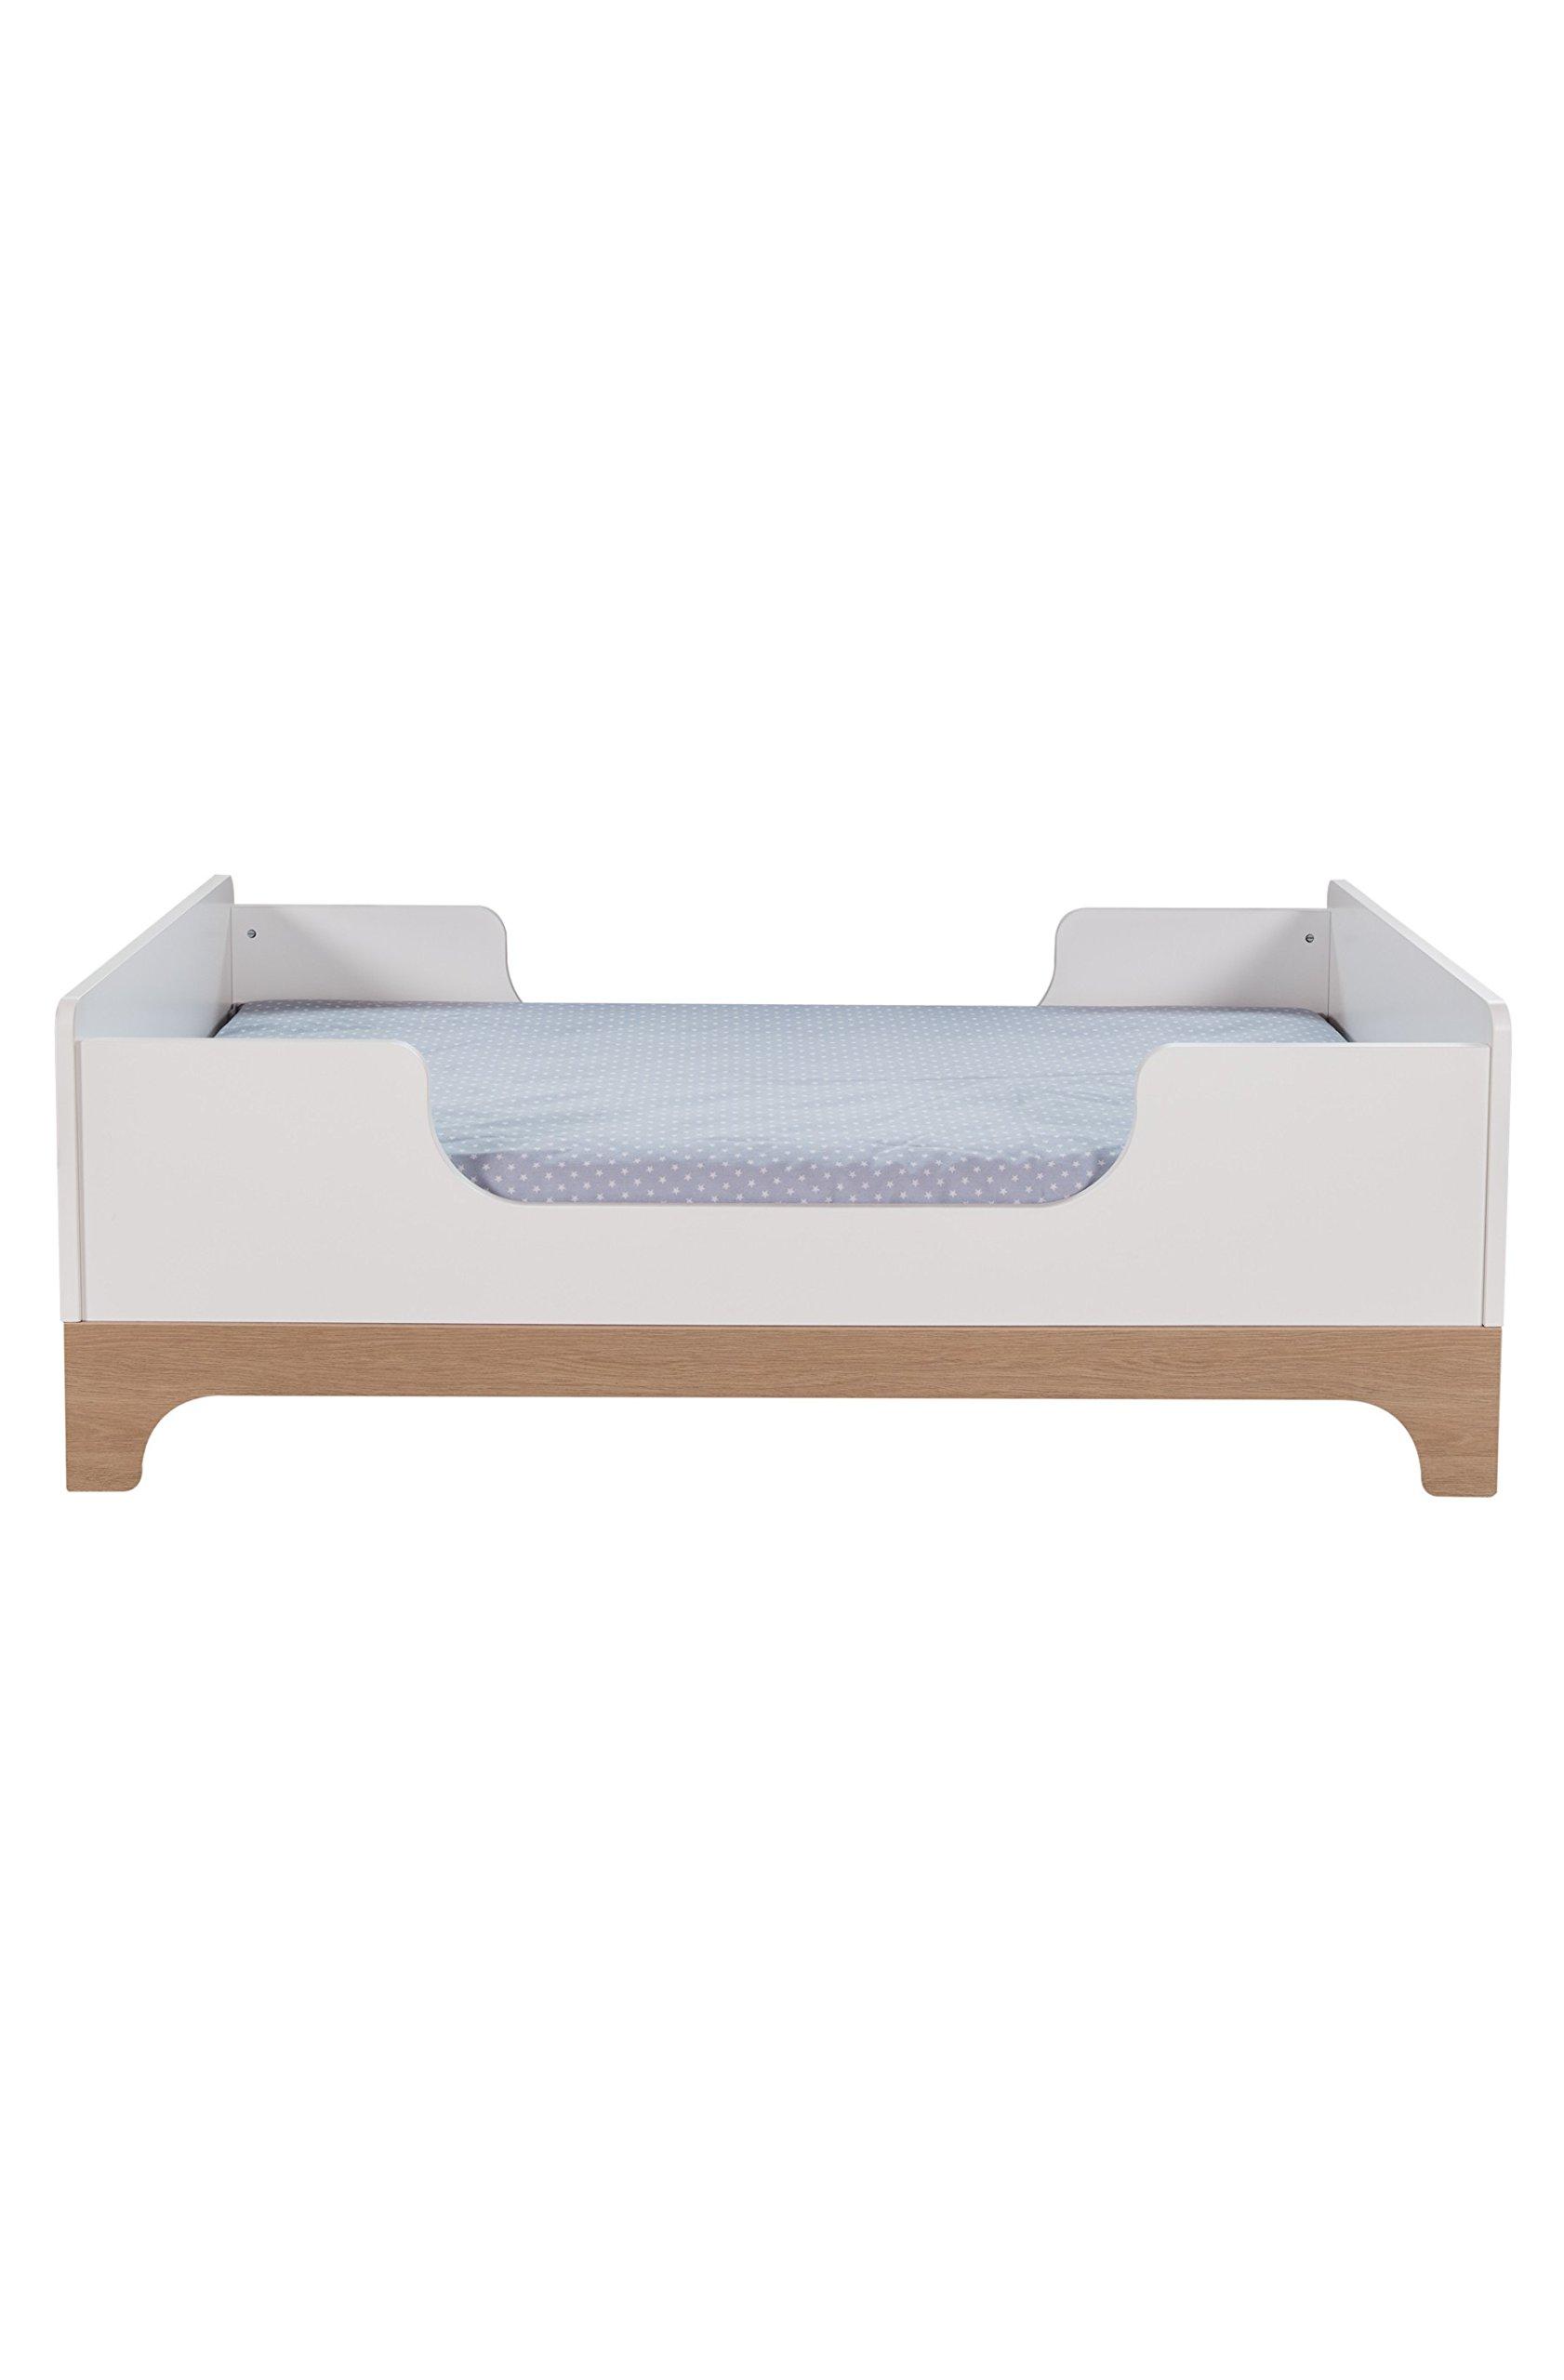 Kadolis Calvi Convertible Bed - 70 x 140 cm Blanco/Madera   3